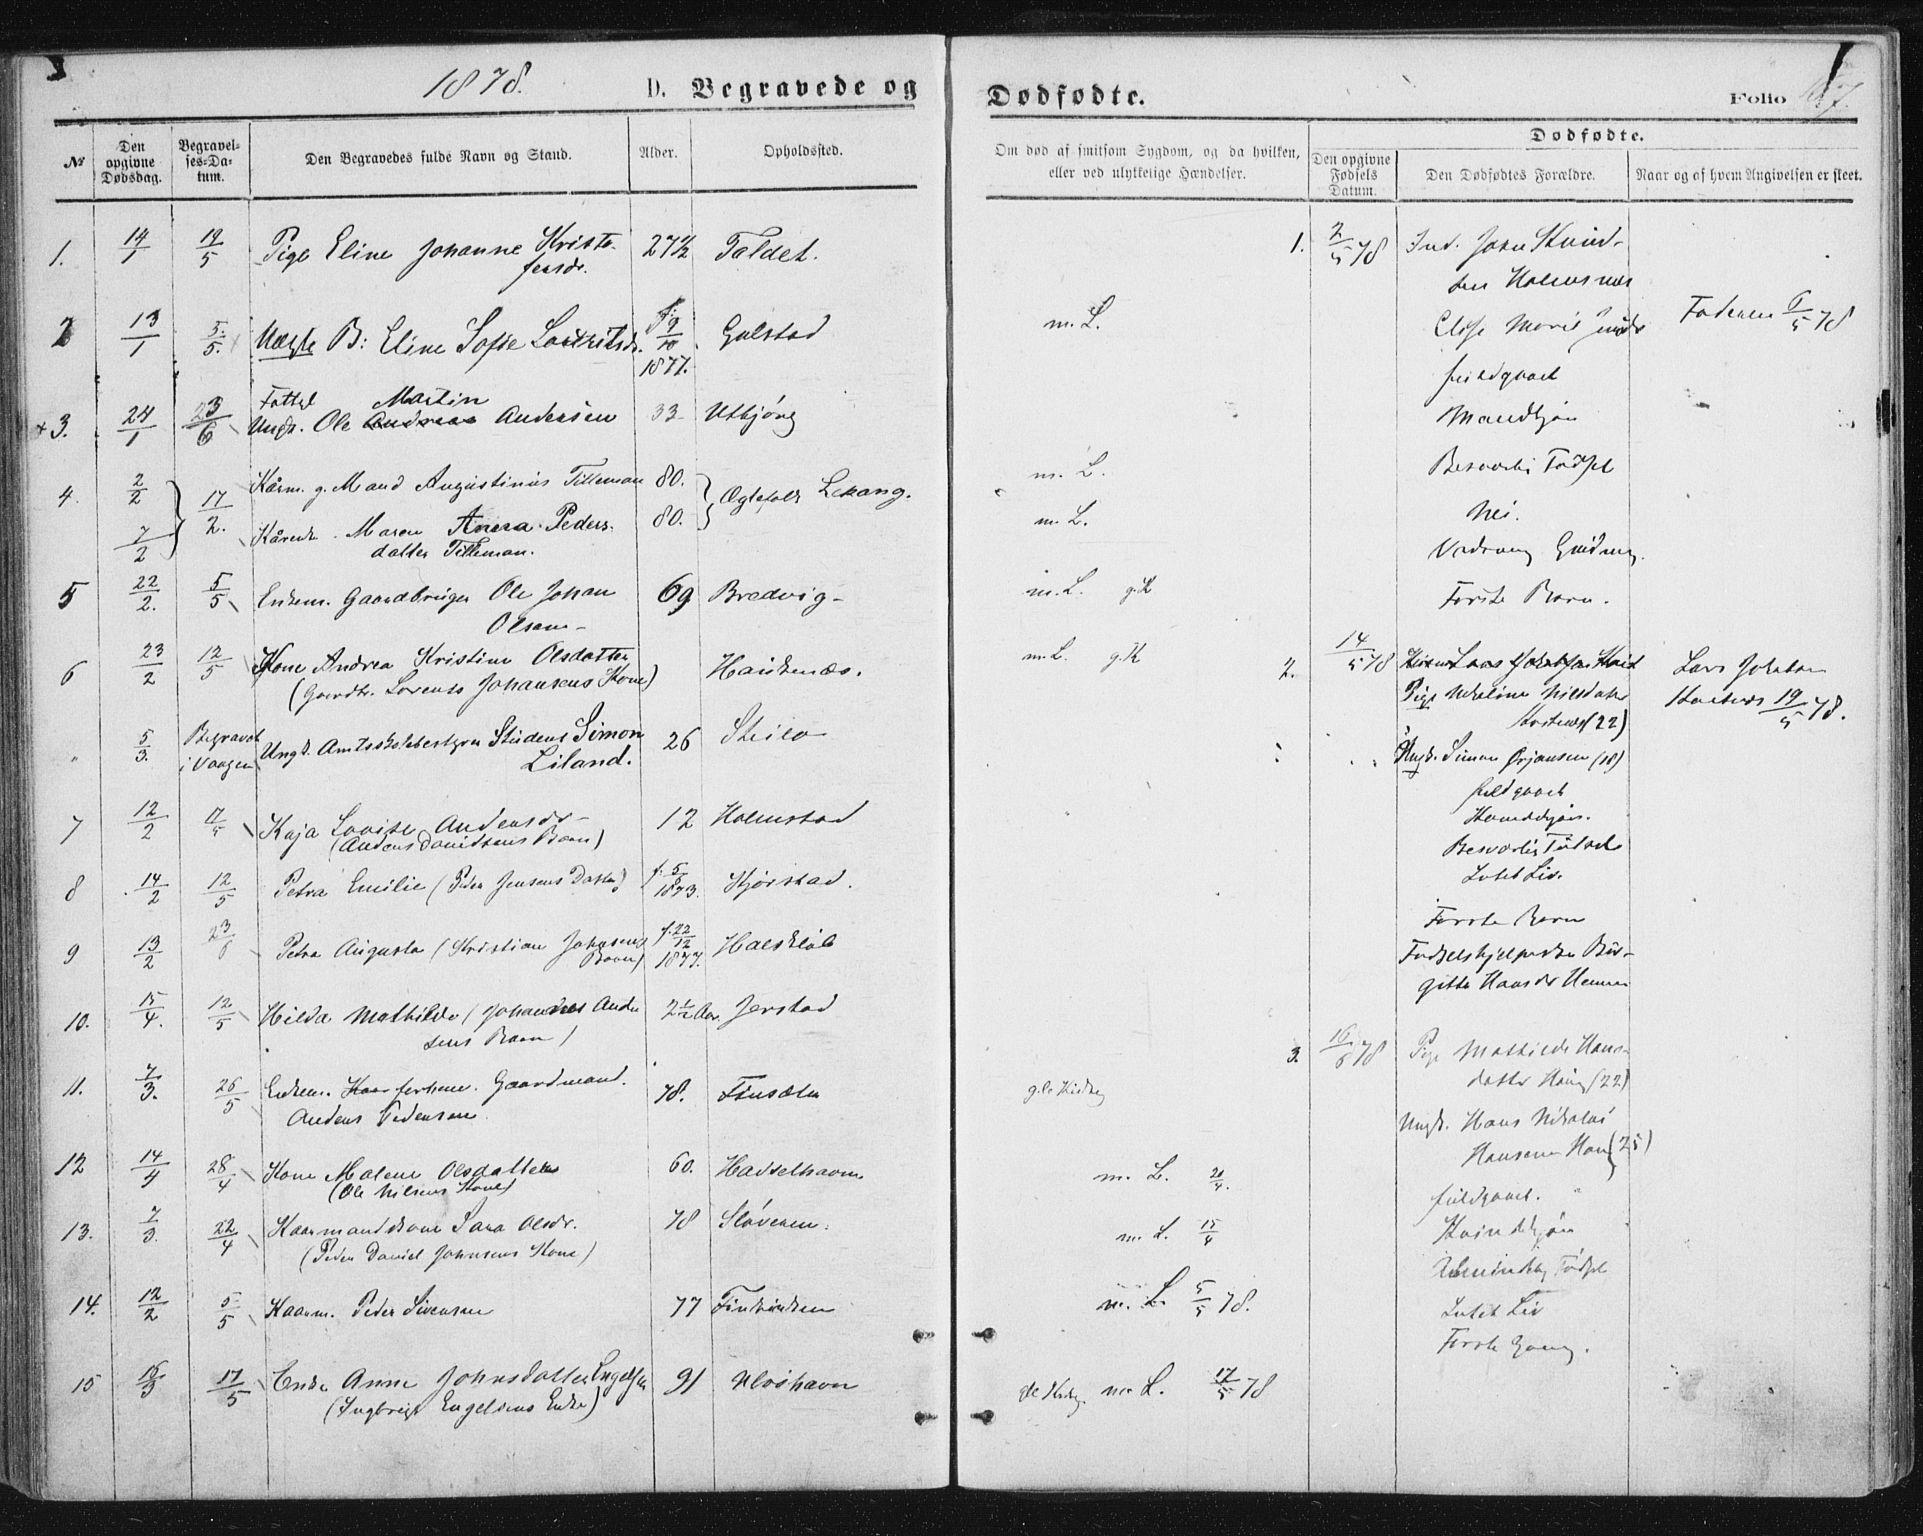 SAT, Ministerialprotokoller, klokkerbøker og fødselsregistre - Nordland, 888/L1243: Ministerialbok nr. 888A09, 1876-1879, s. 167